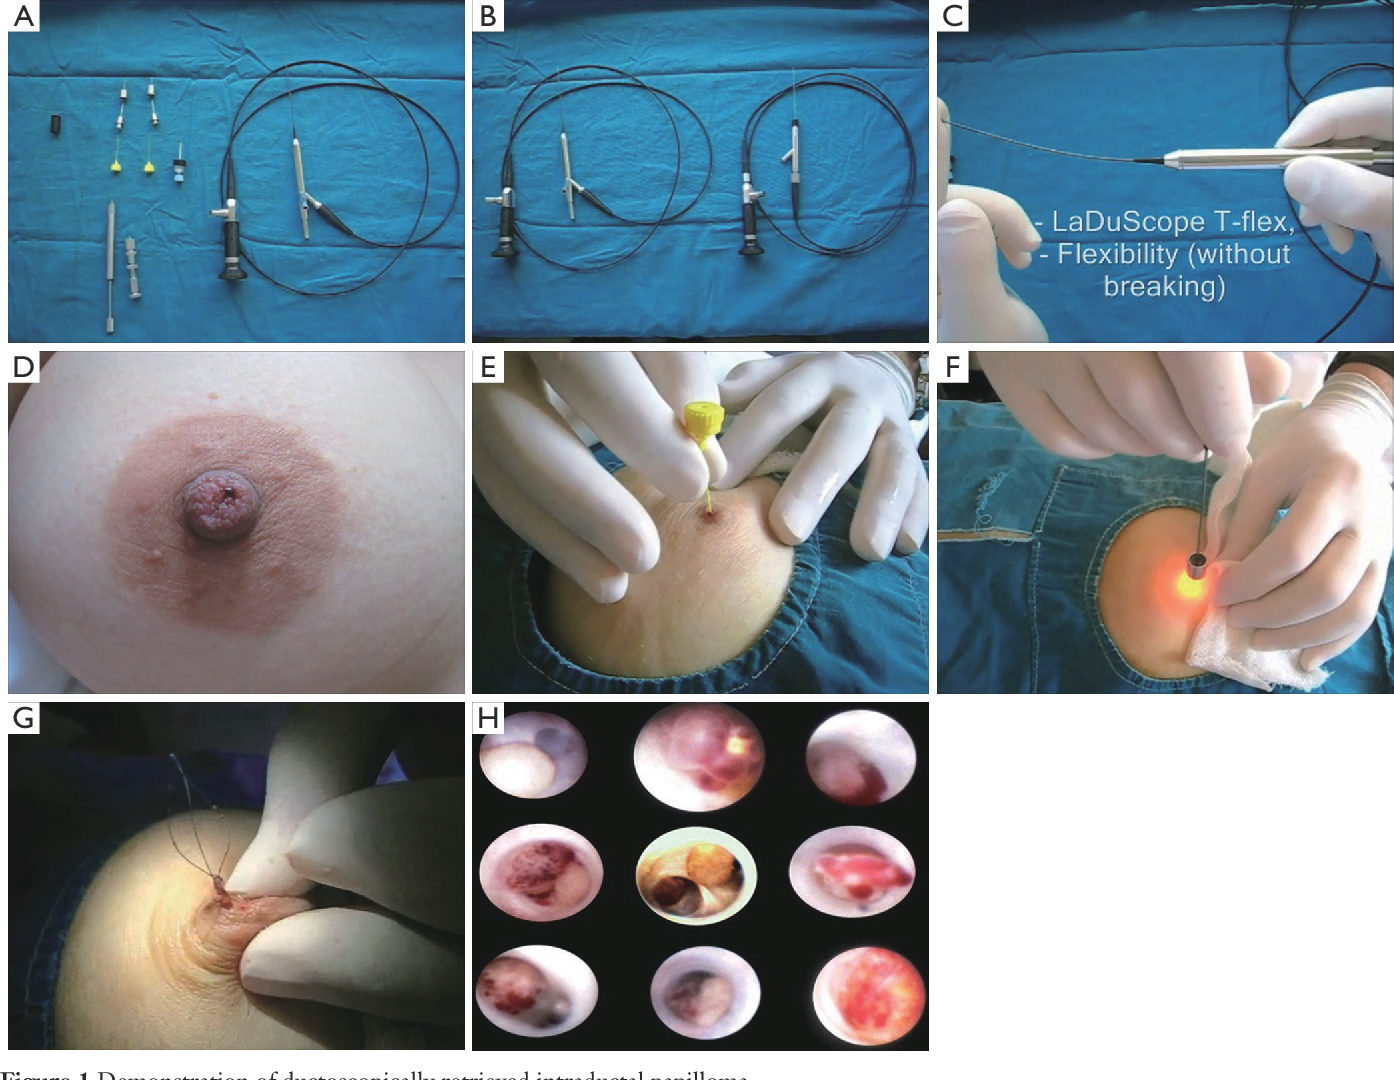 intraductal papilloma ducts papilloma virus contagio uomo